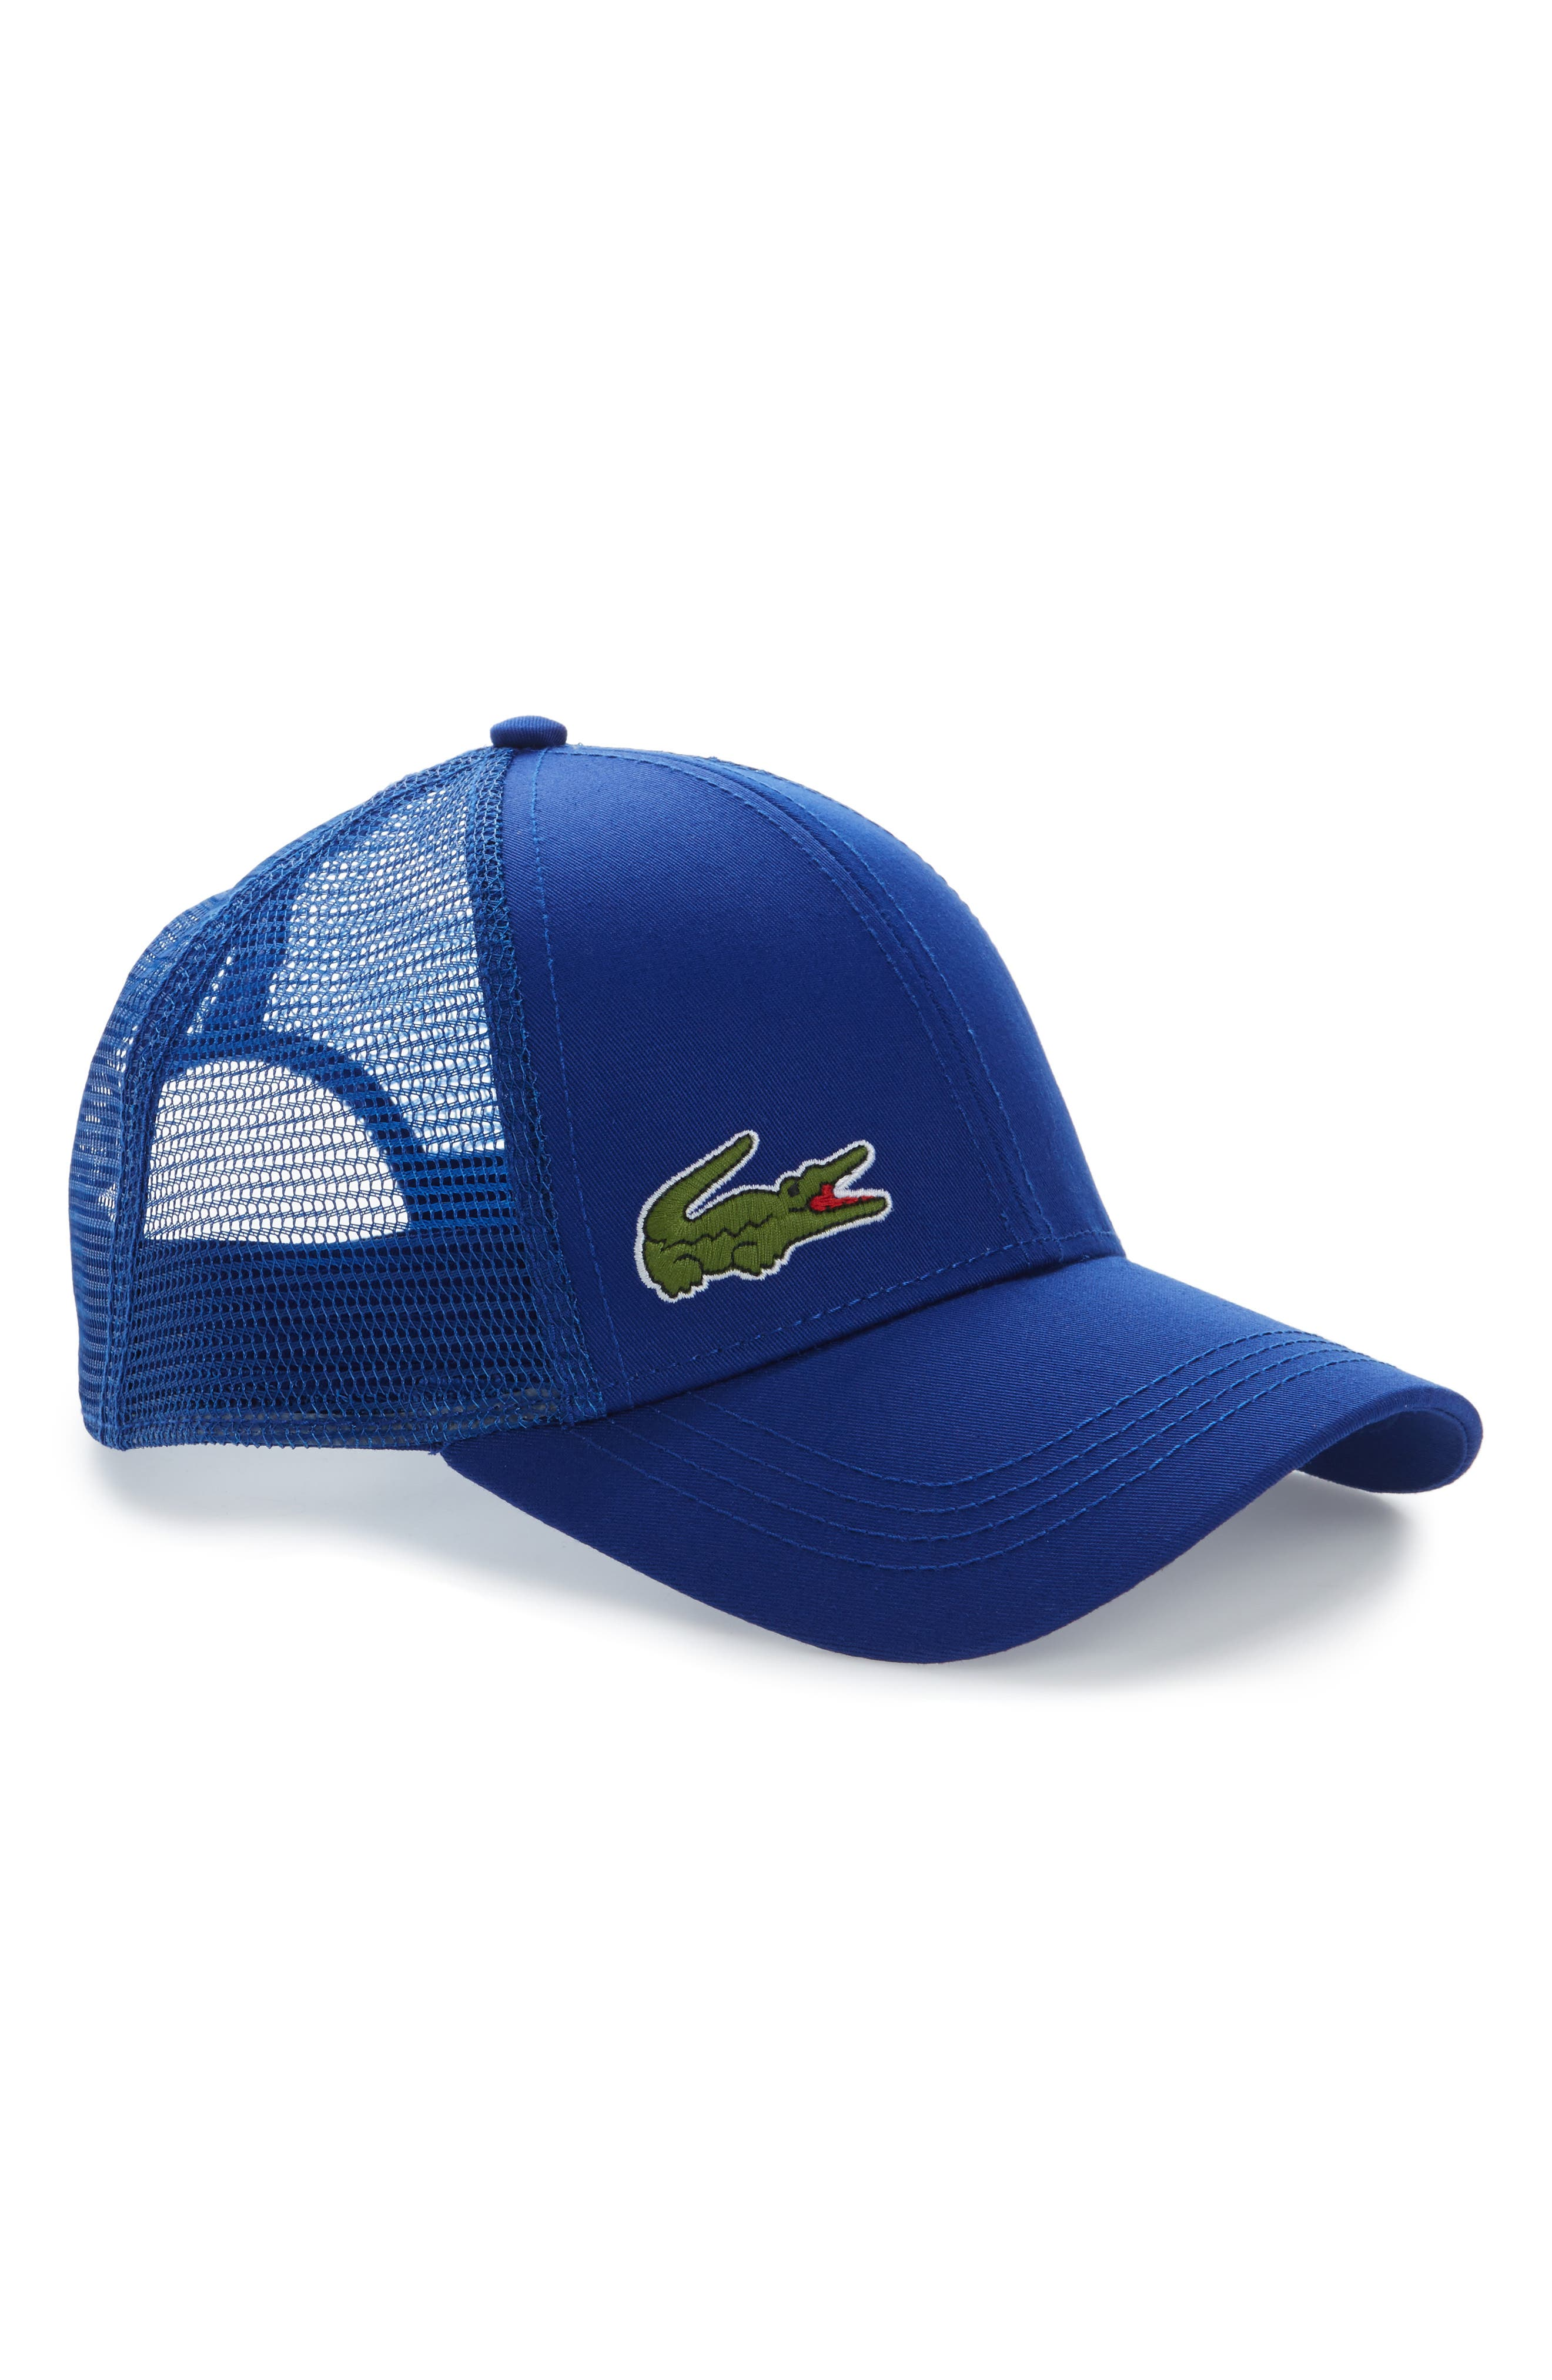 Alternate Image 1 Selected - Lacoste Trucker Hat